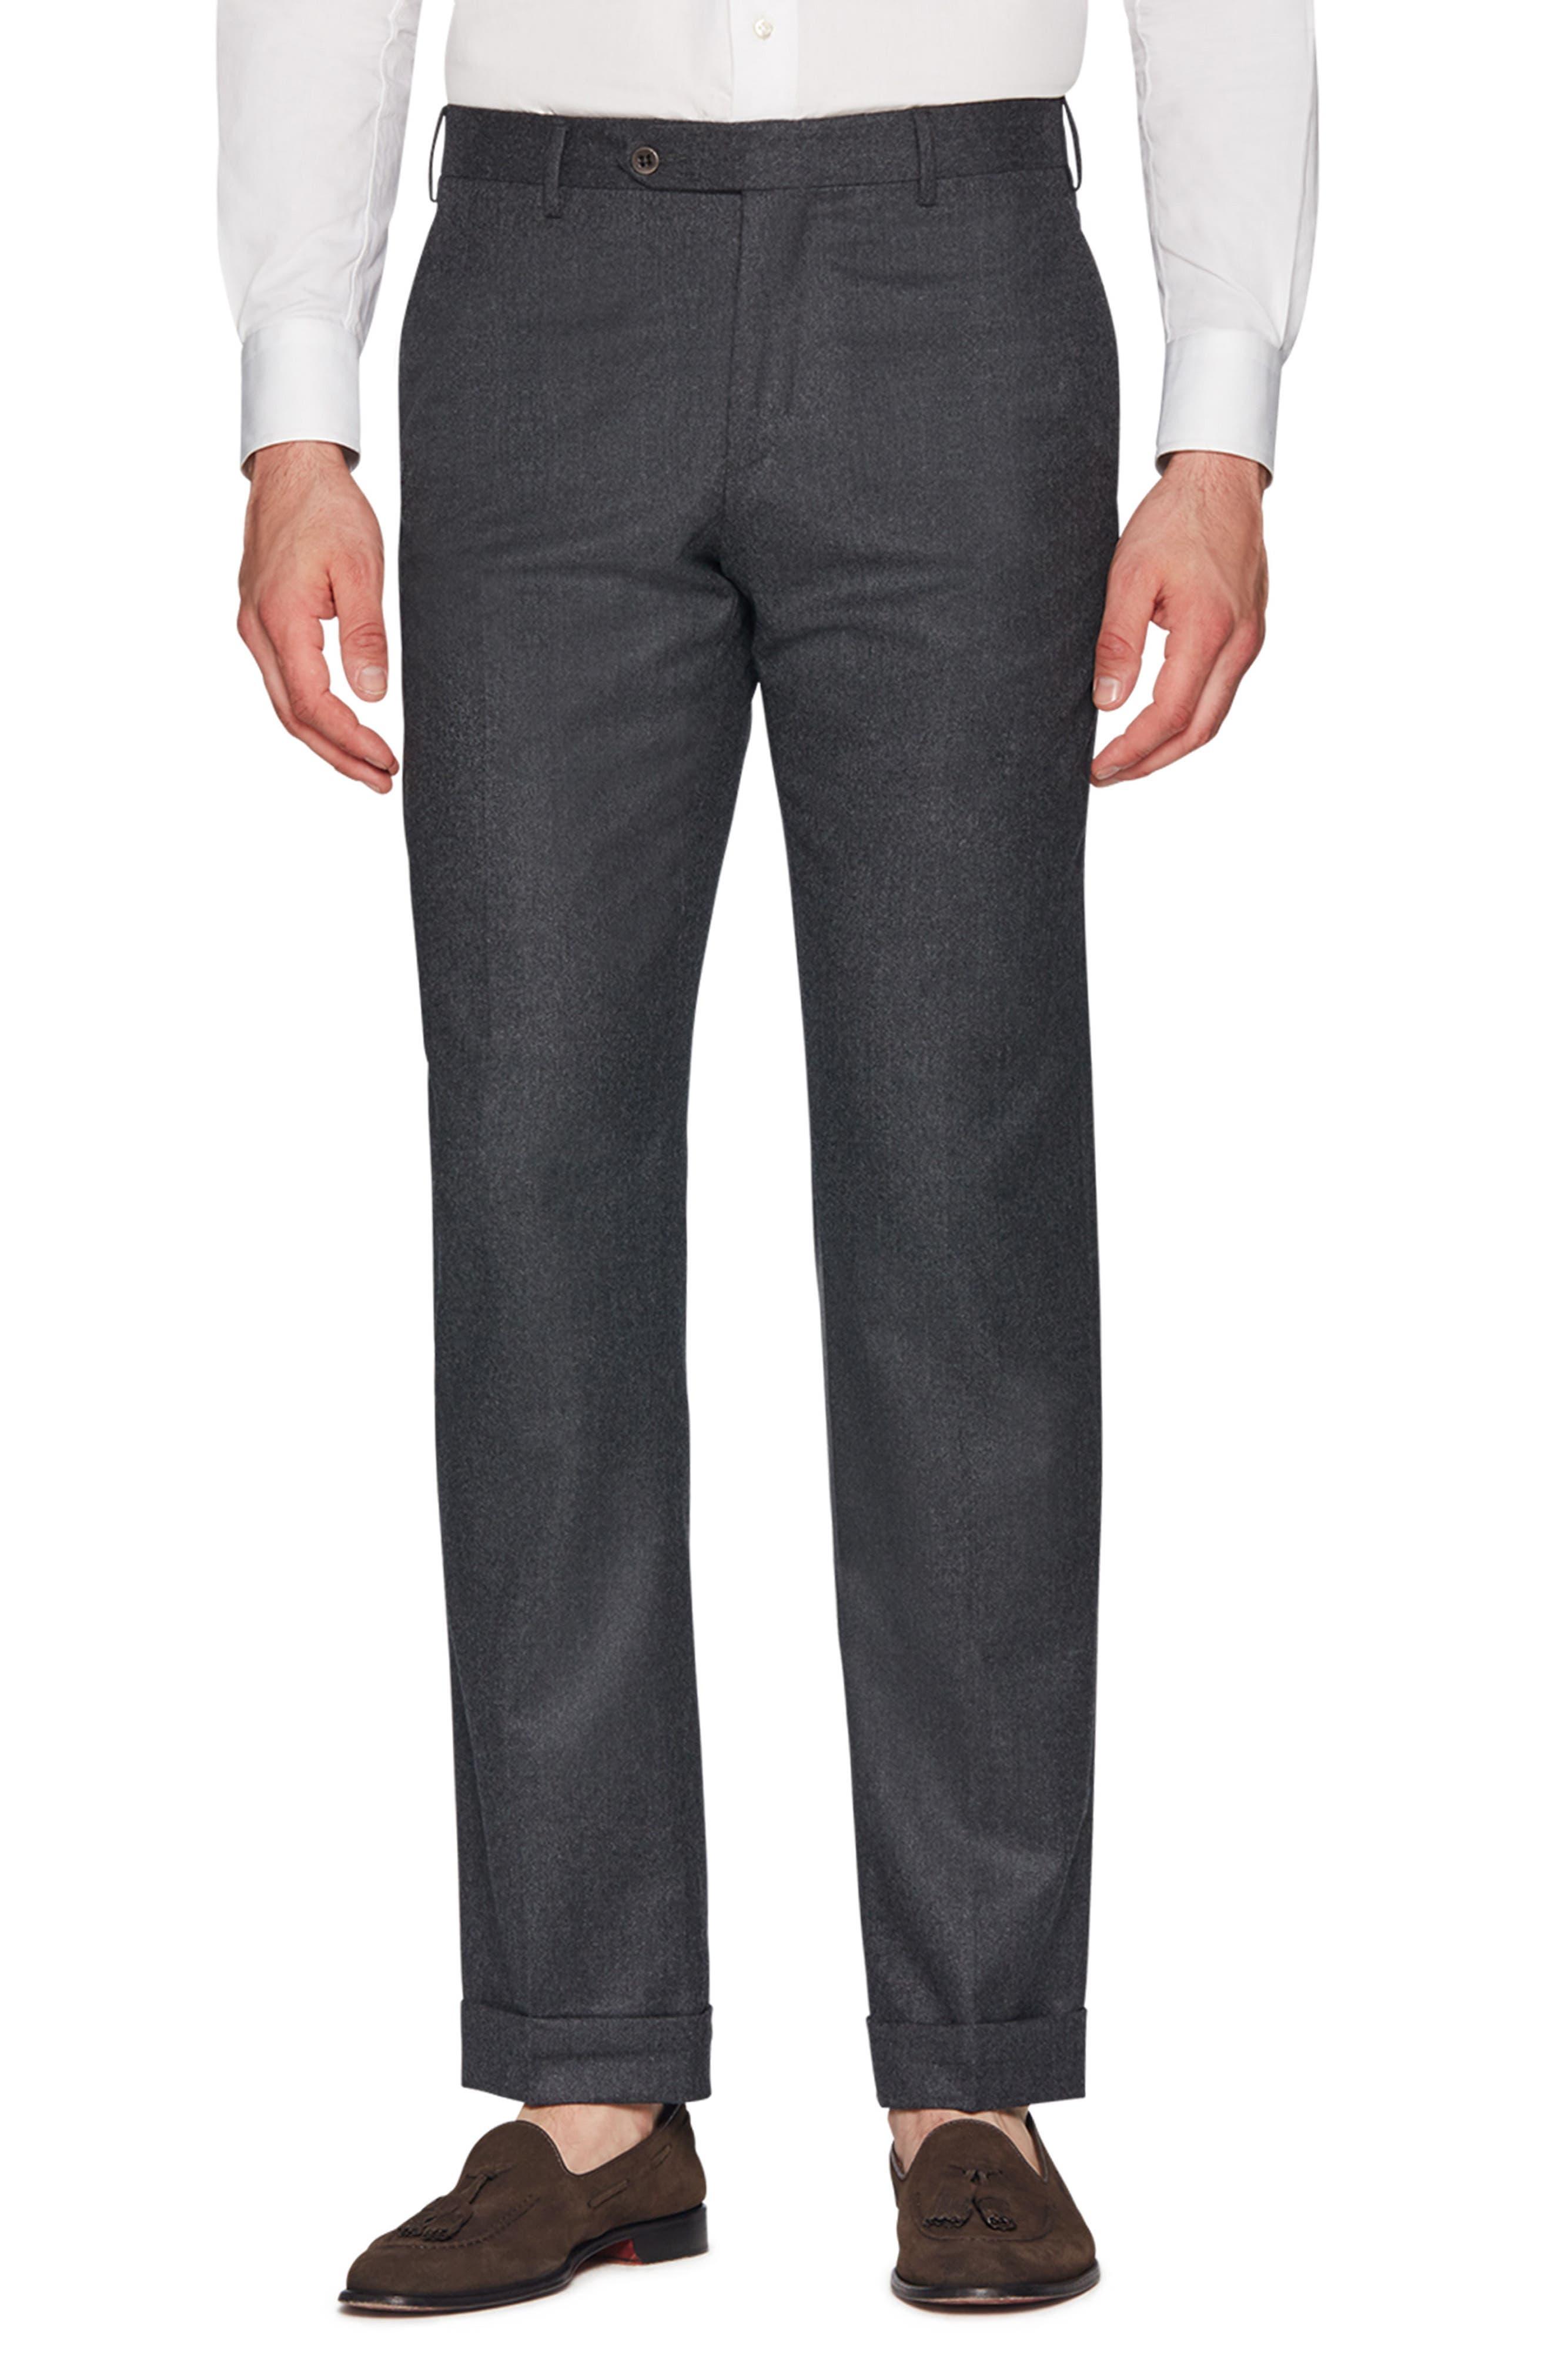 ZANELLA Parker Flat Front Wool Flannel Trousers in Charcoal